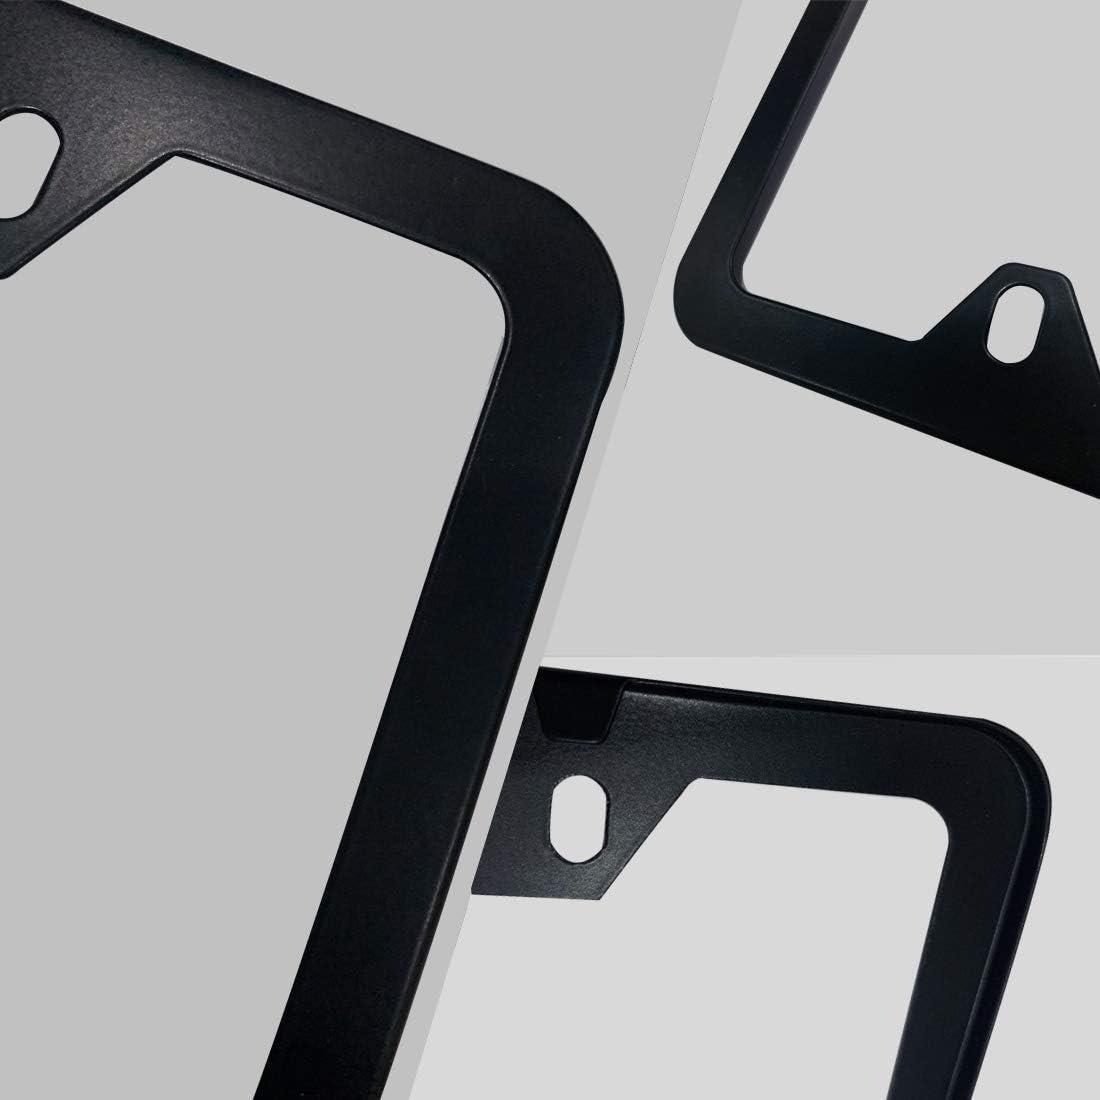 2Pcs Fit Bears License Plate Frame Car Accessories,The Latest Aluminum Alloy Bears License Plate Frame,License Plate Frame for American Standard Size